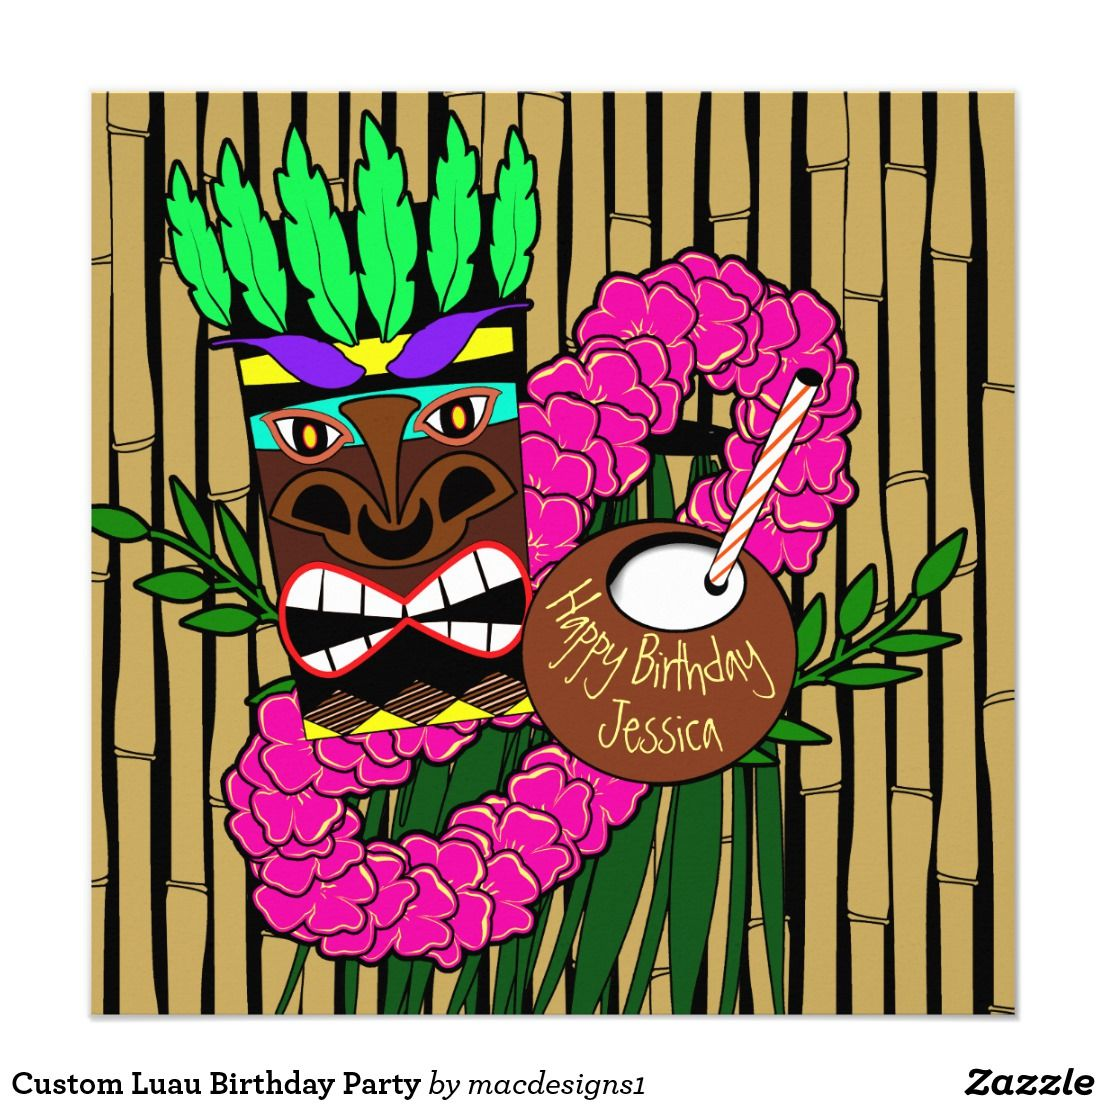 Custom Luau Birthday Party Card